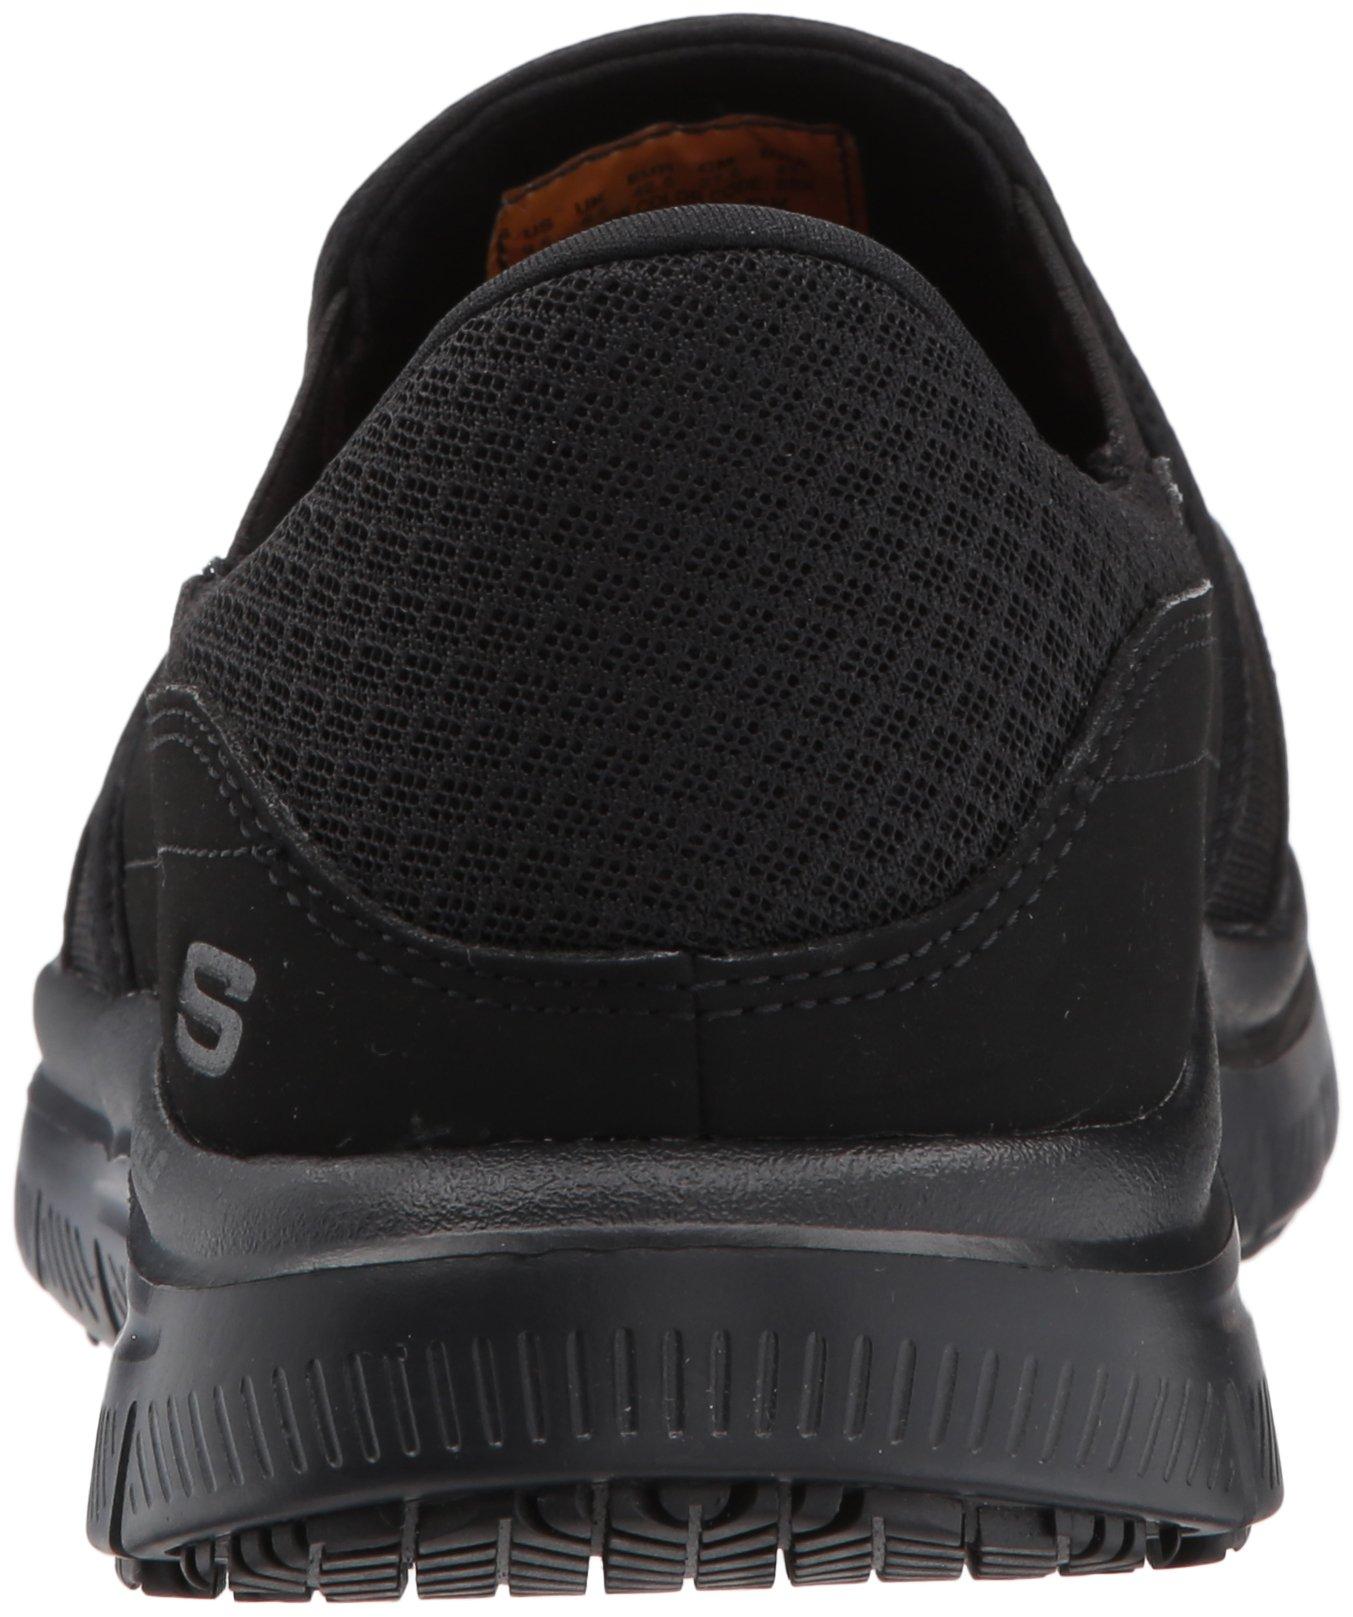 21ebd90181a9 Skechers Men s Black Flex Advantage Slip Resistant Mcallen Slip On - 9 3E -  Extra Wide - 77048EW-7-9 Extra Wide US   Health Care   Food Service    Clothing